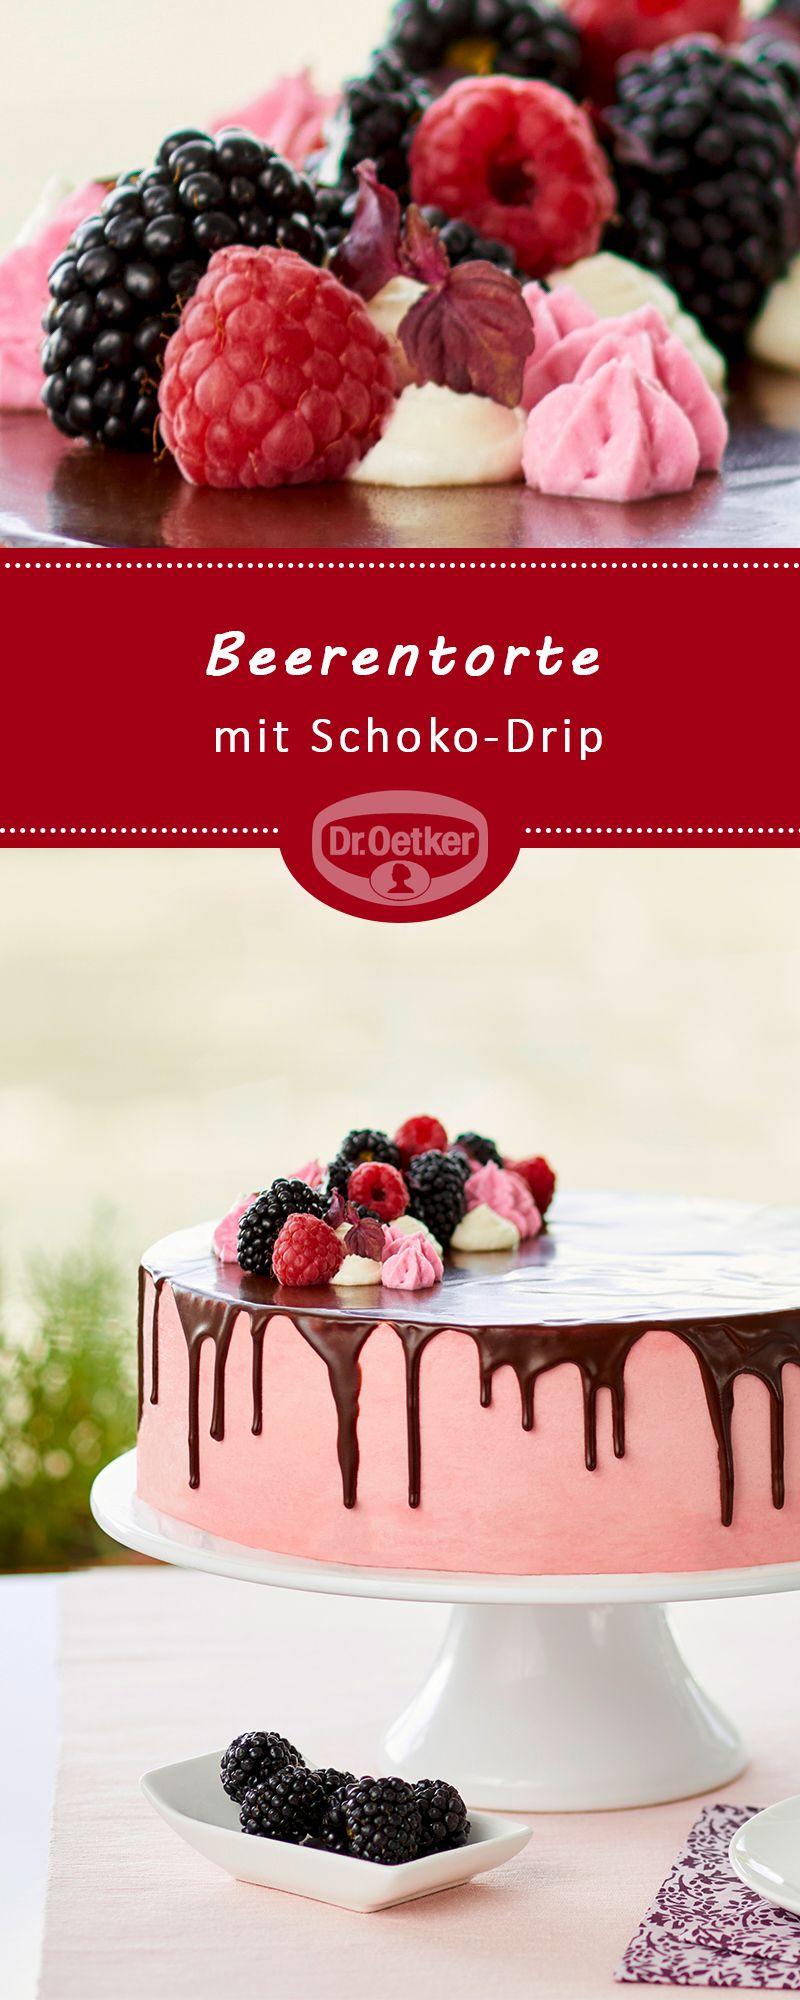 Beerentorte mit Schoko-Drip #tortenrezepte